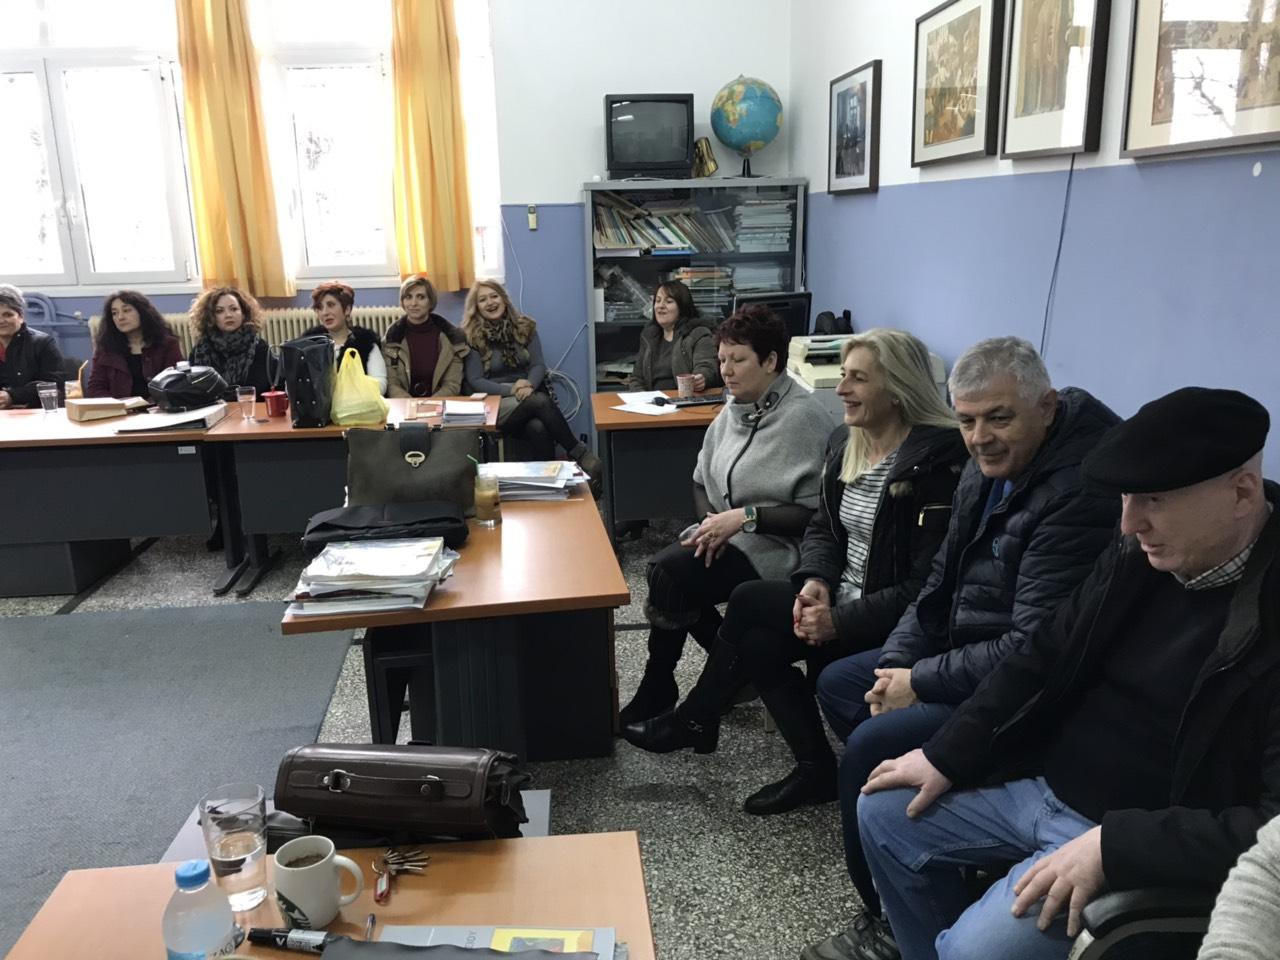 sxolia tirnavos 4 - Σε σχολεία του Τυρνάβου ο Σεβασμιώτατος (φωτ.)